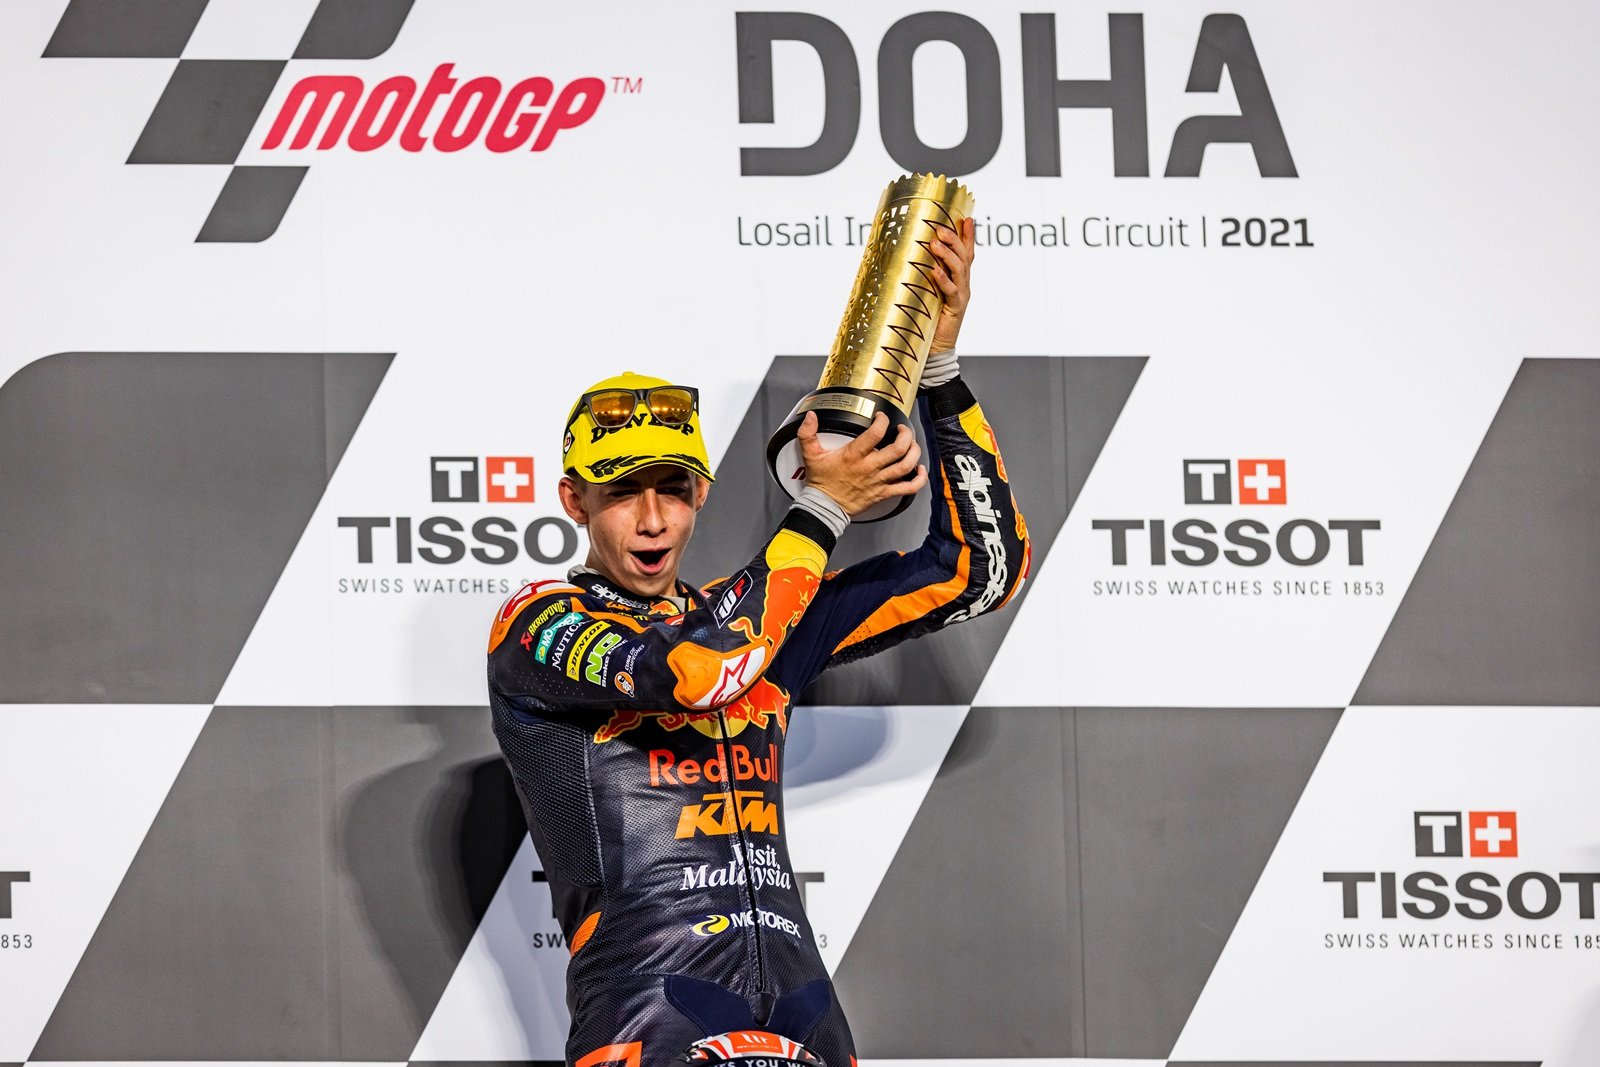 Pedro Acosta does magic in Moto3 Qatar race 2